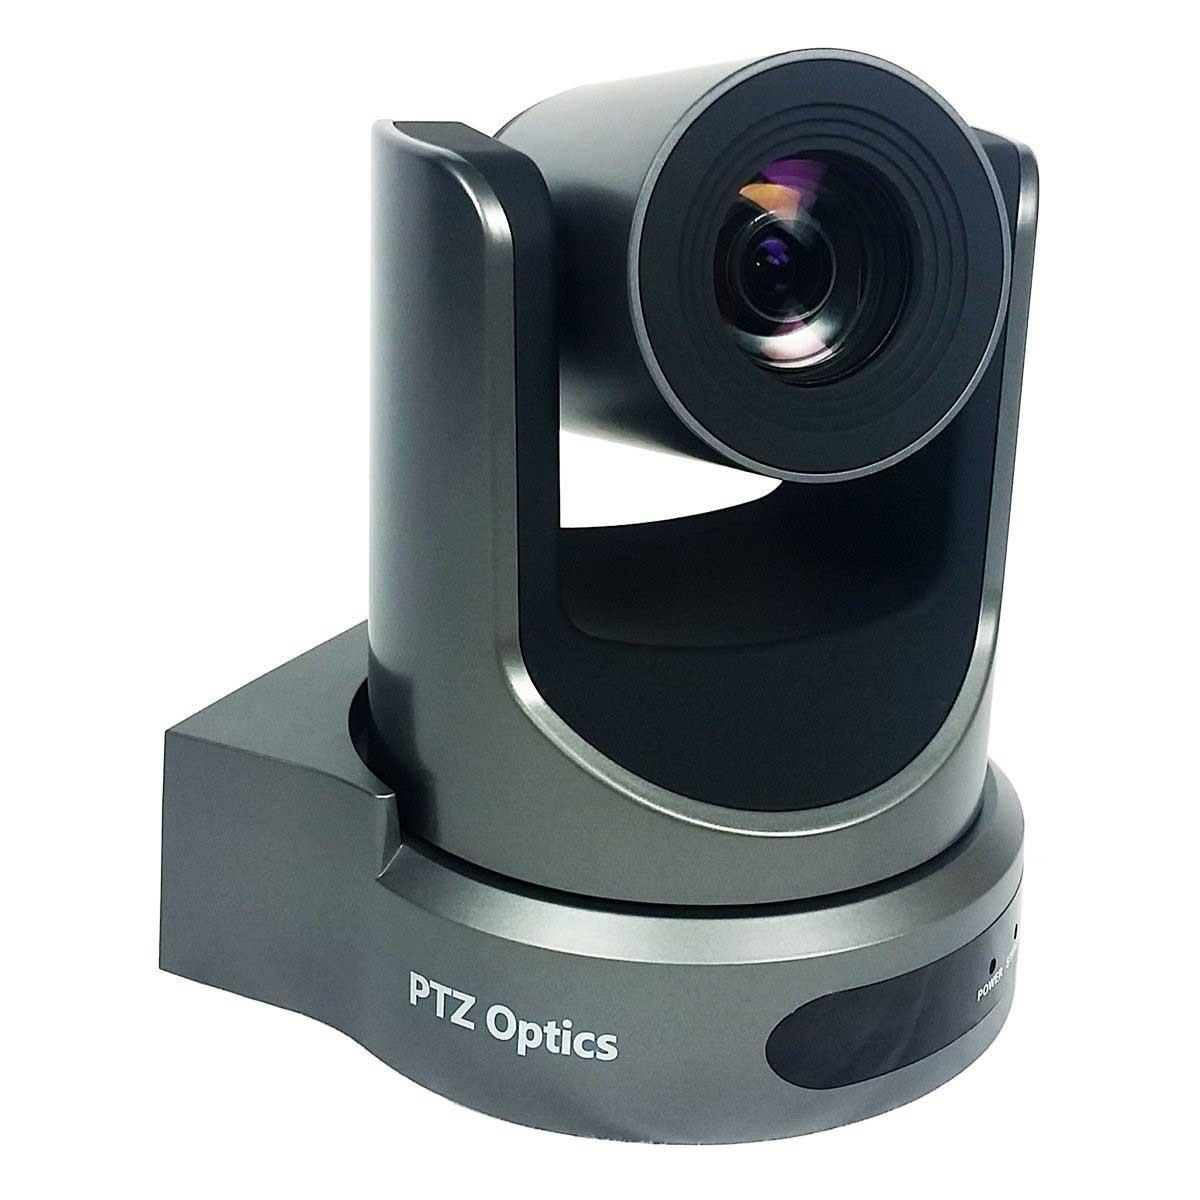 Beste Kamera für Livestreams